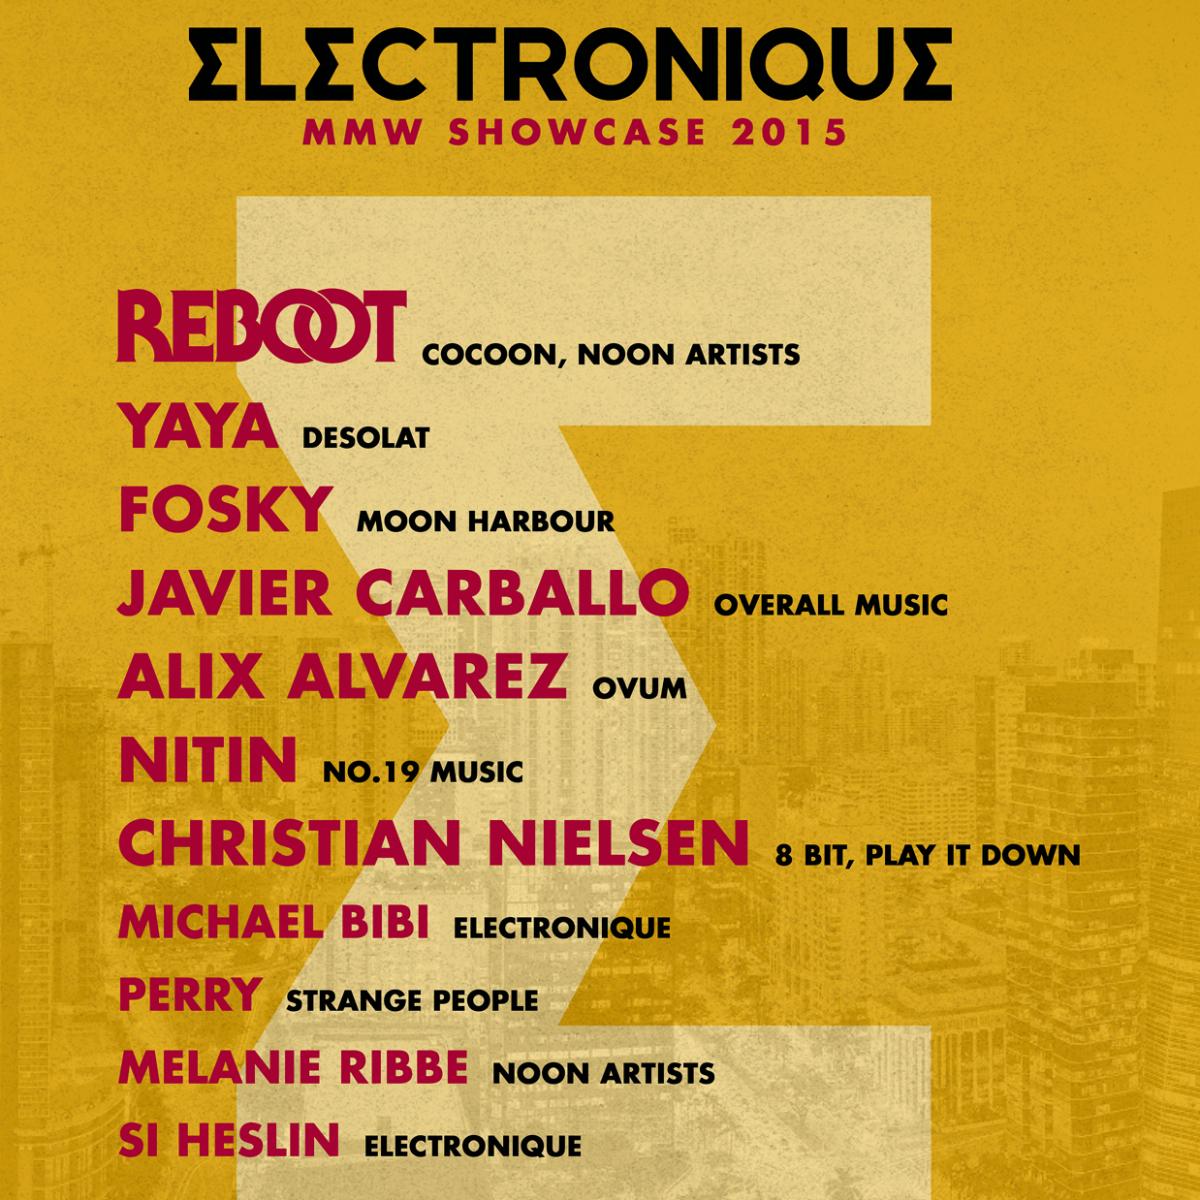 Electronique Showcase featured